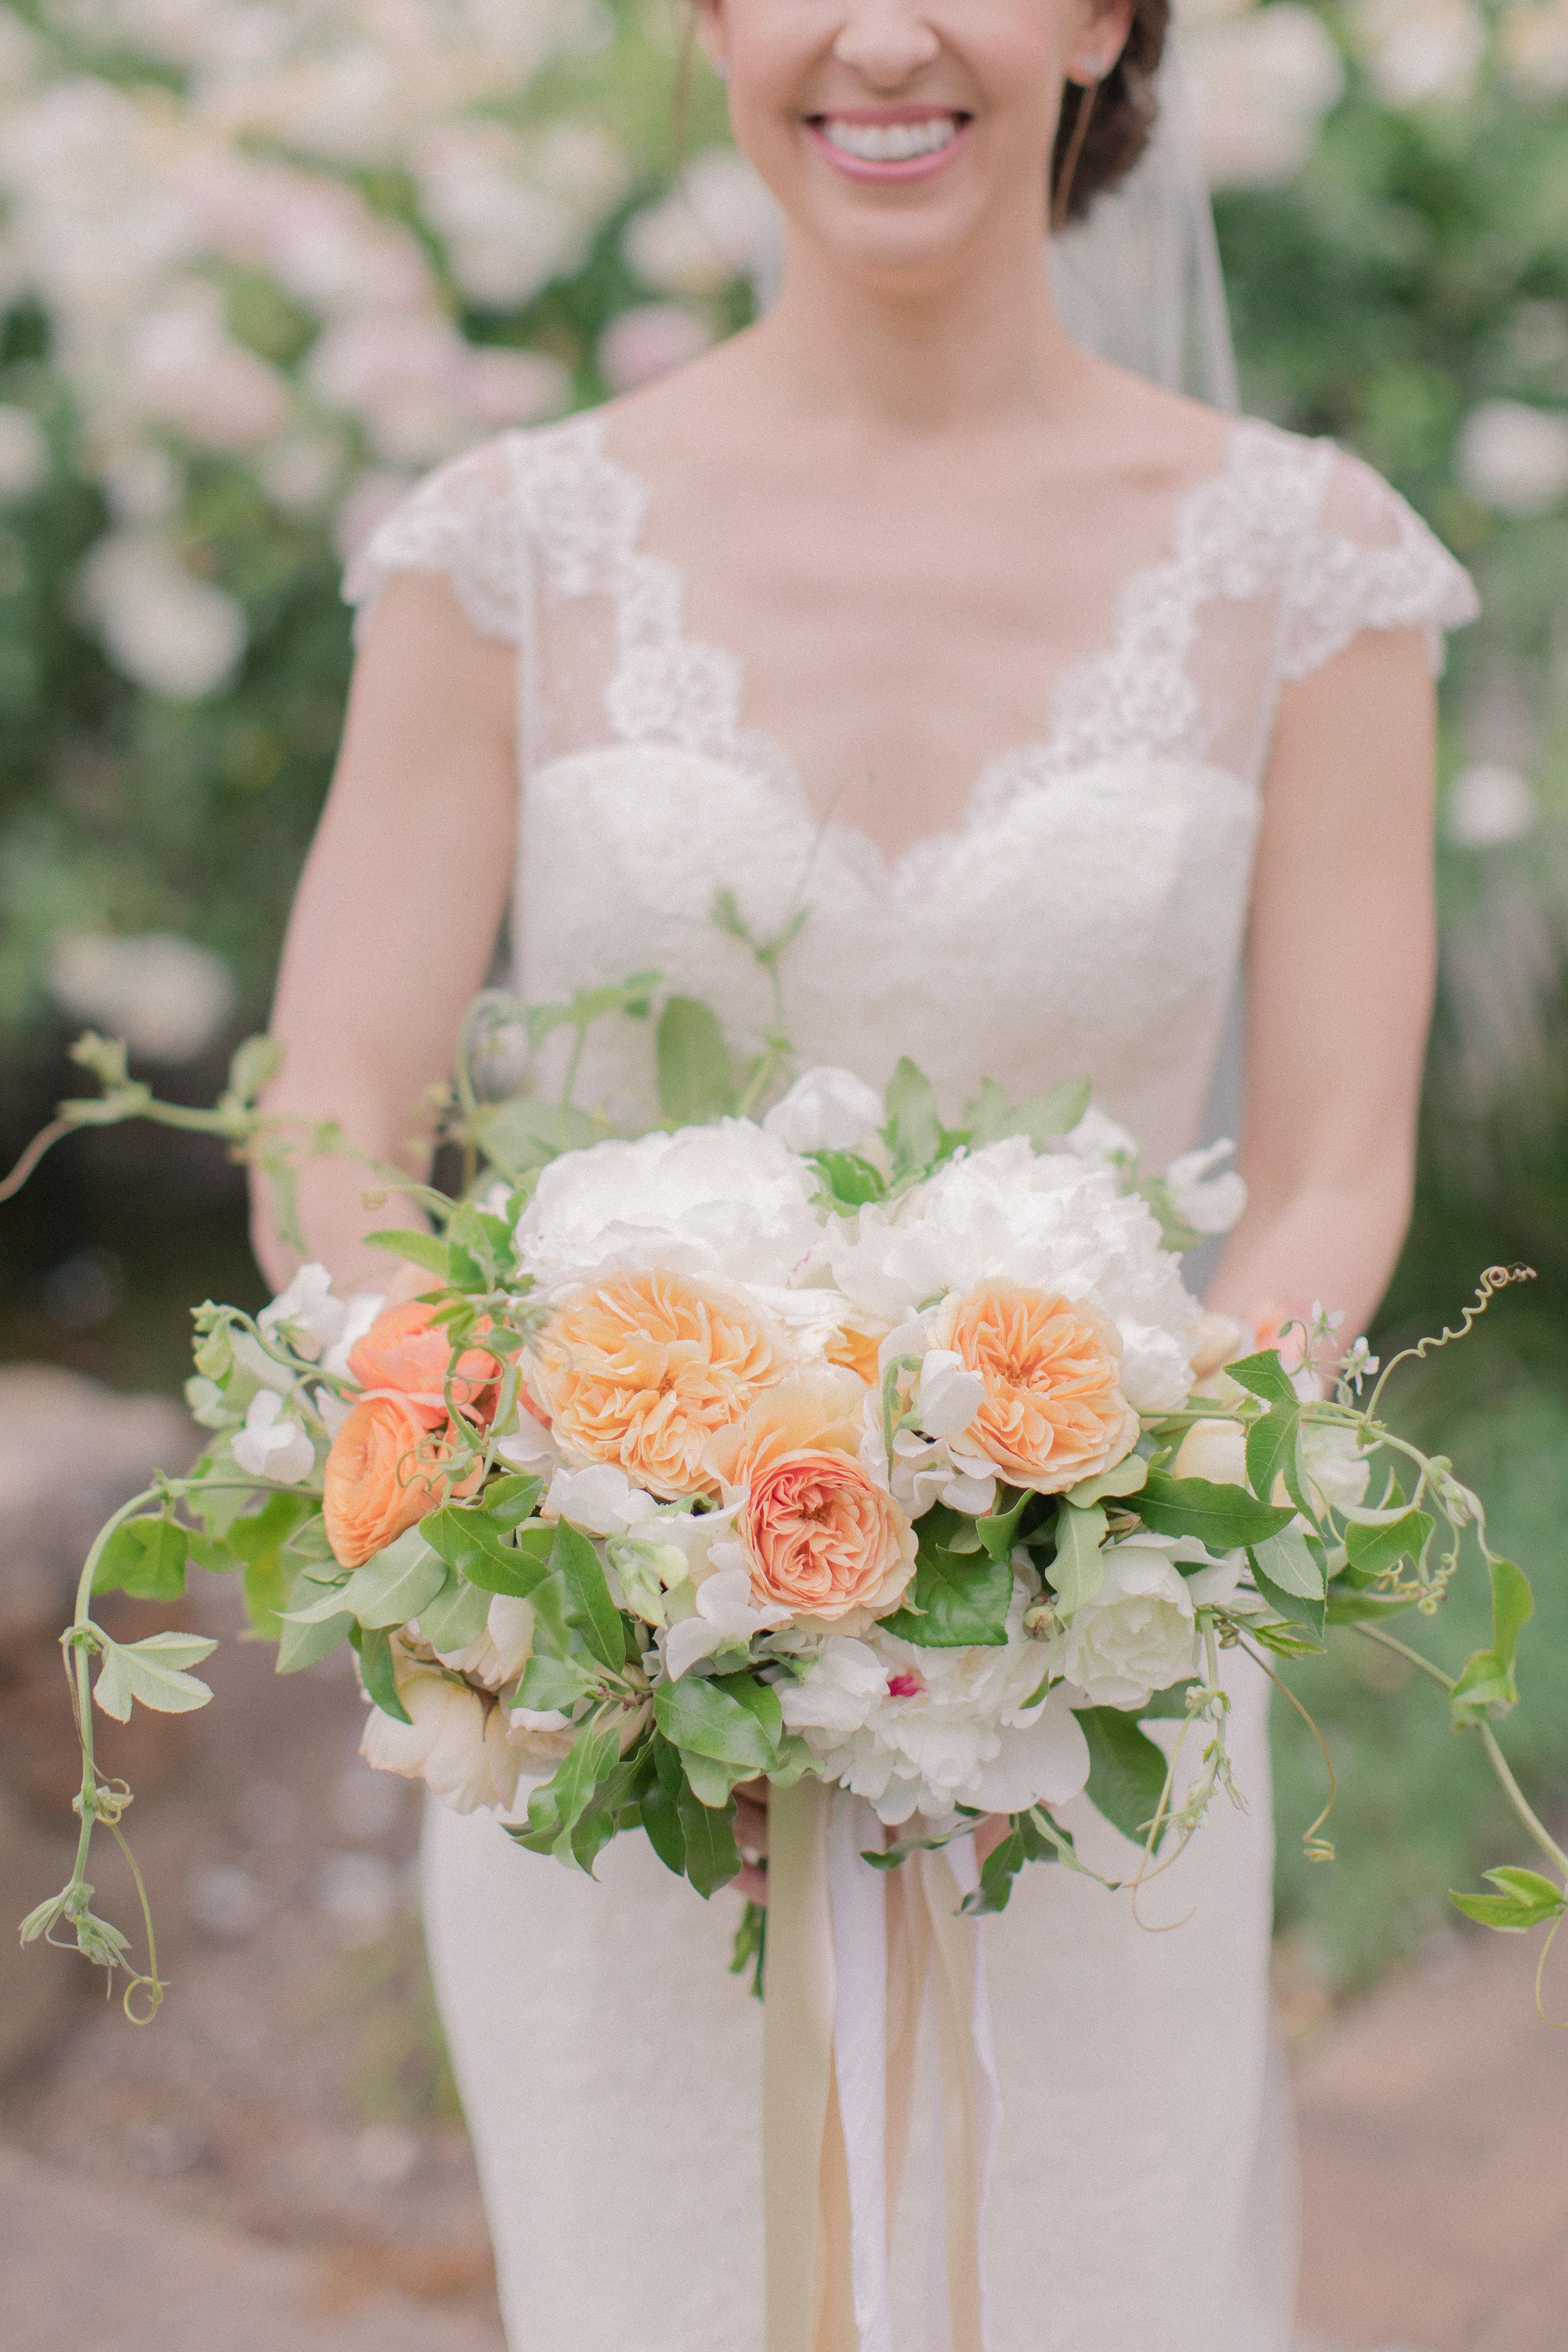 california-wedding-day-lrelyea-events-lori-paladino-photography1.jpg